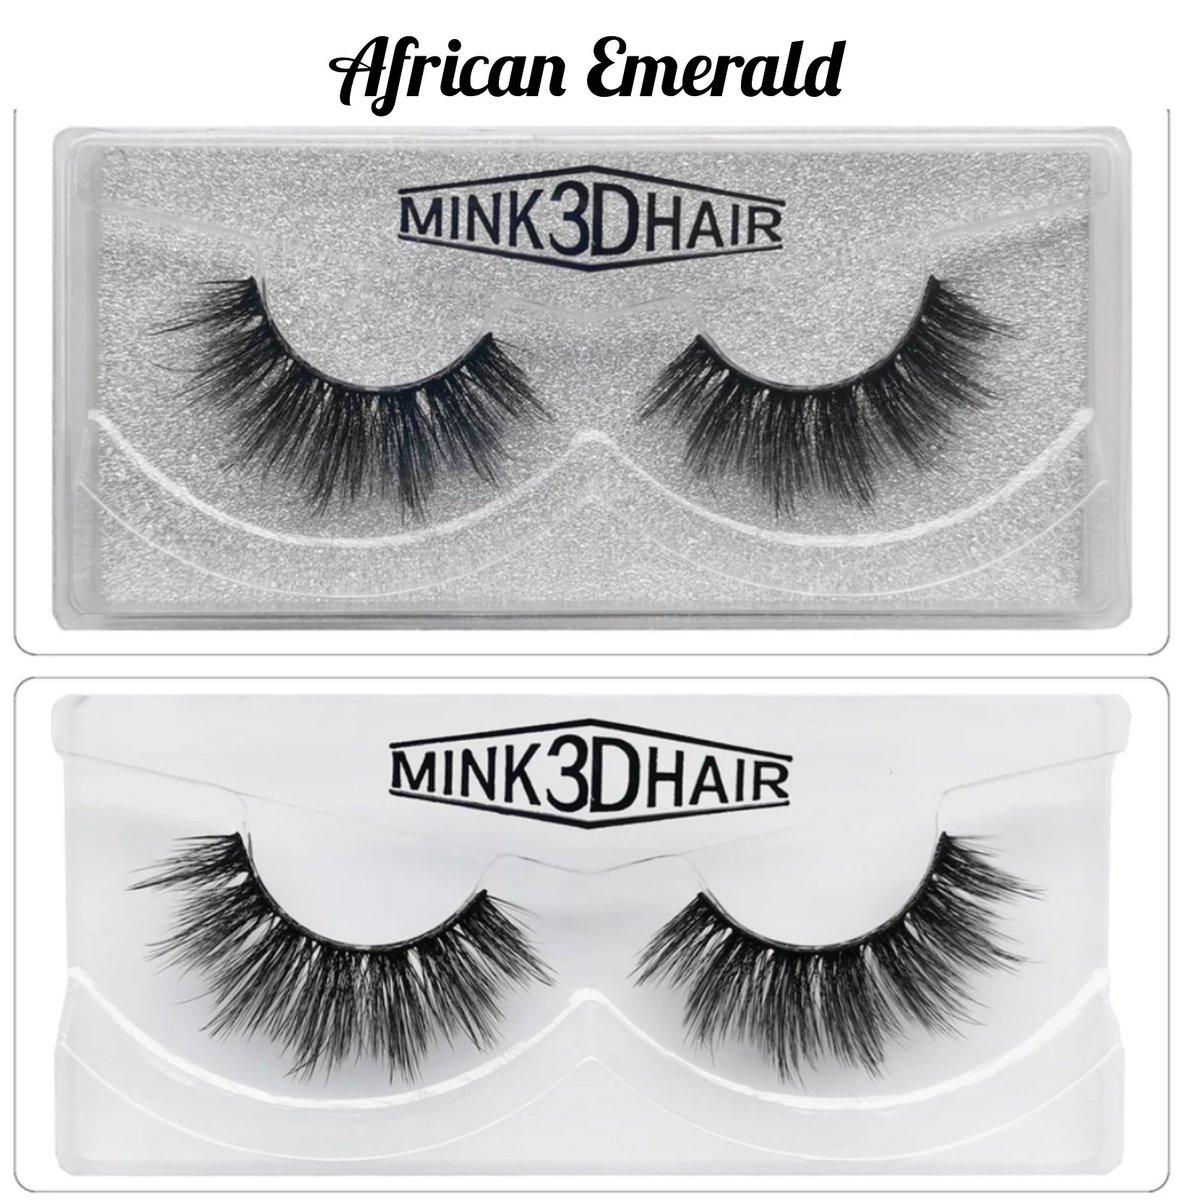 African Emerald #3DMink Range#MADLuxLashes #AfricanEmerald #LashObsession #ClassyMakeUp #DailyMakeUp #LashBoss #LashesForSale #GemStones #Emerald #LuxuryMakeUp #StripLashes #LashBeauty #NaturalLashes #MakeUpAddict #ForSale #AffordableFashion #BlackOwnedBussinesspic.twitter.com/eKRmiVyk1i